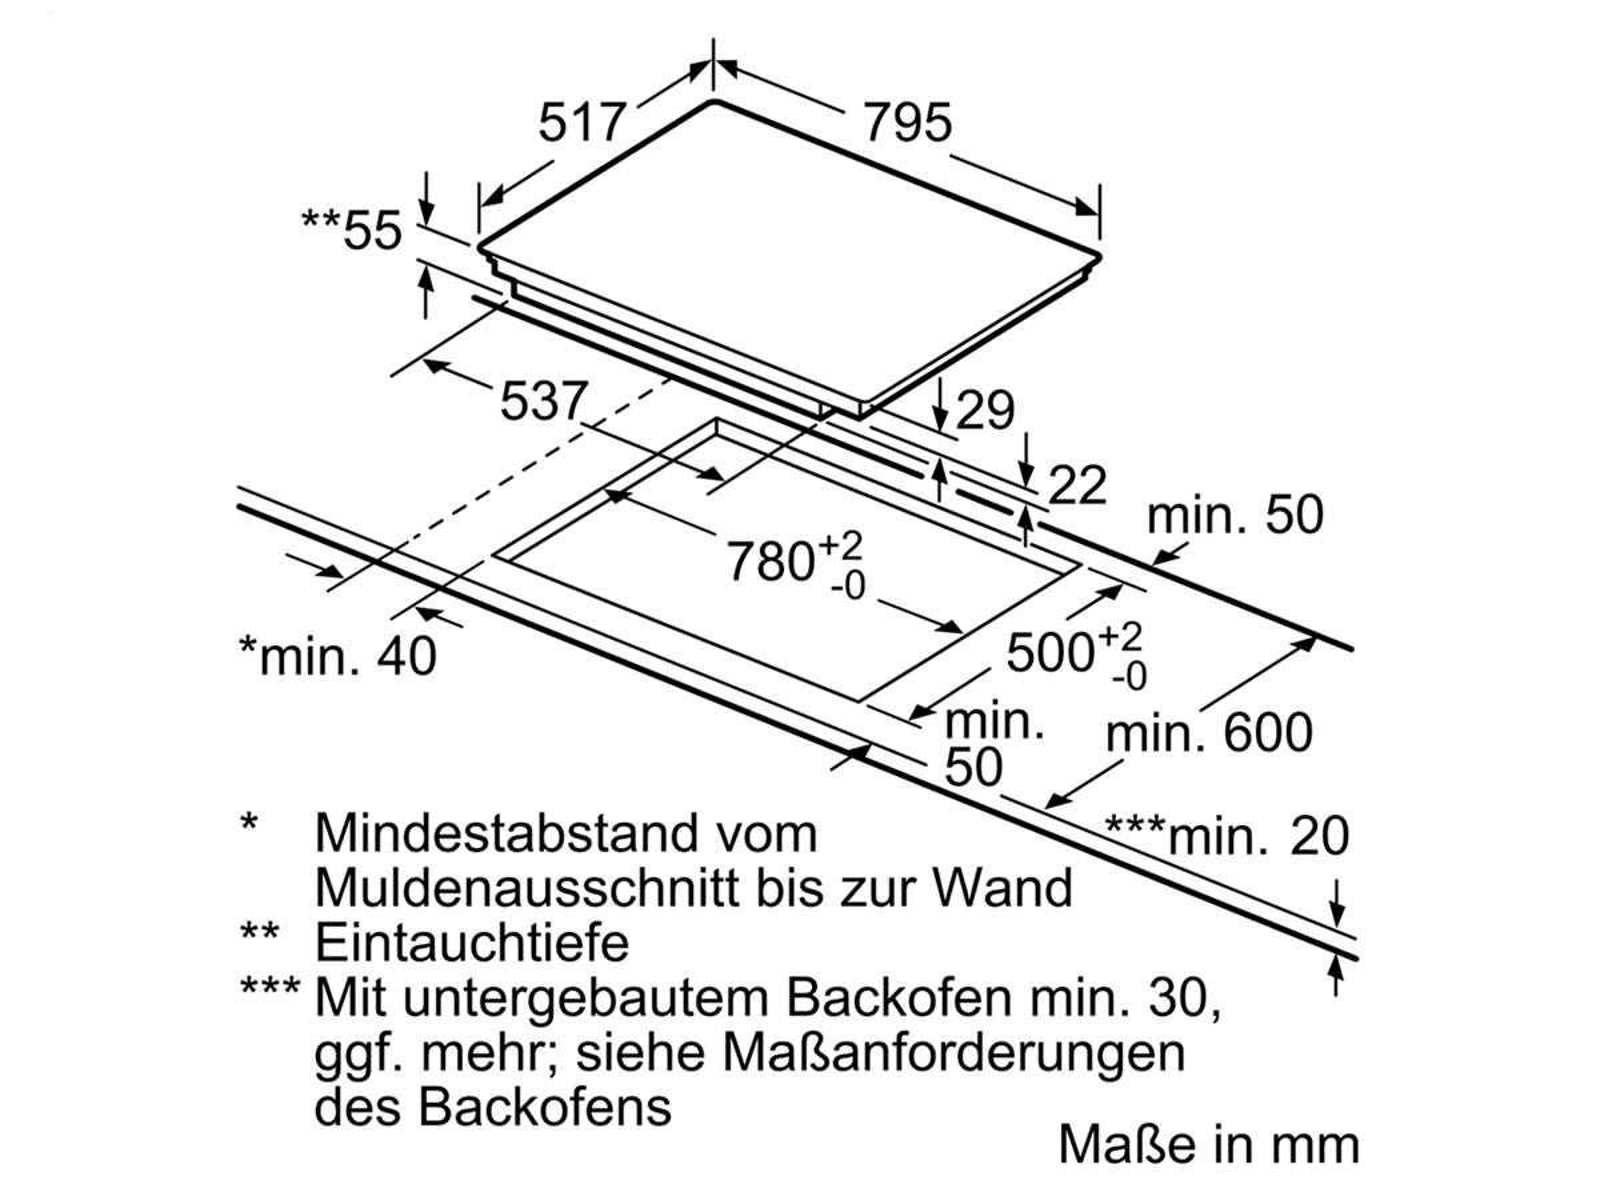 siemens eq2z104 set backofen mit mikrowelle hm633gns1 induktionskochfeld ex845fvc1e. Black Bedroom Furniture Sets. Home Design Ideas